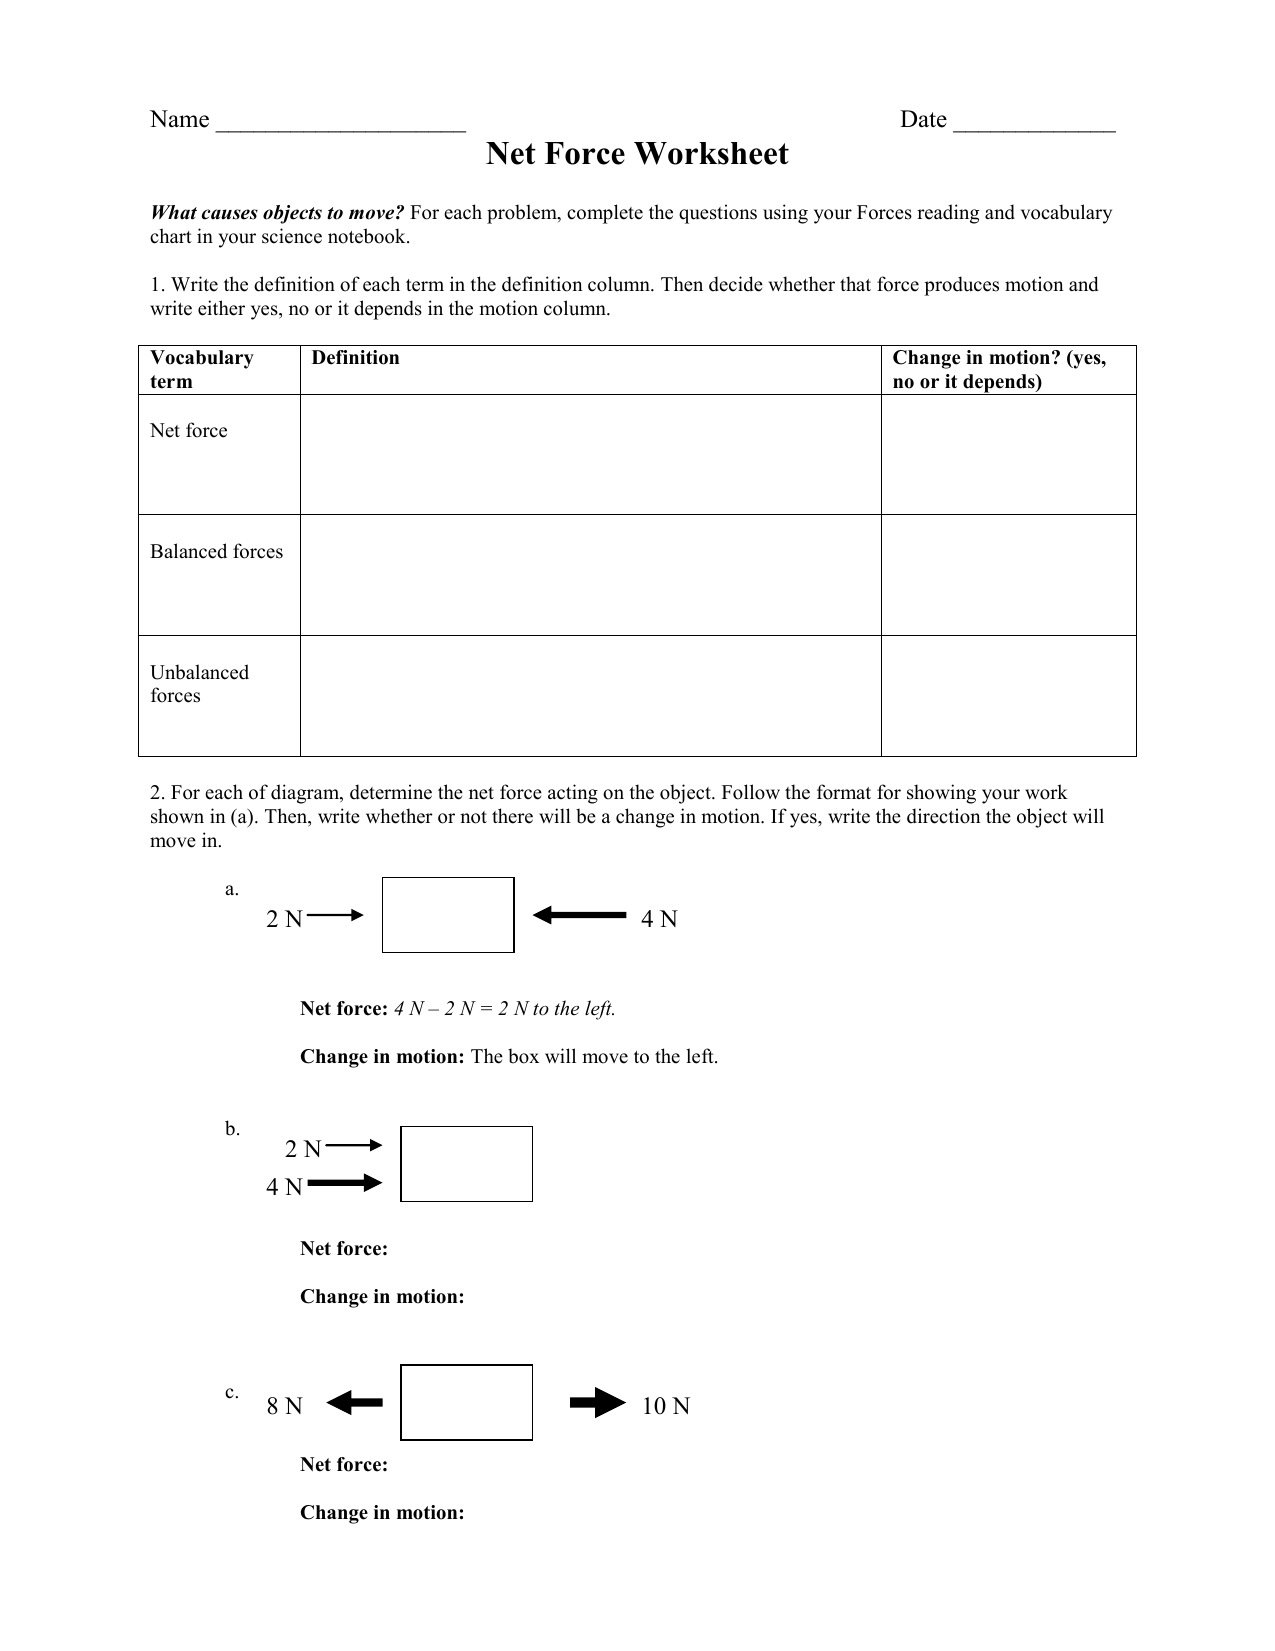 Net Force Worksheet - CRJH 8th Grade Science